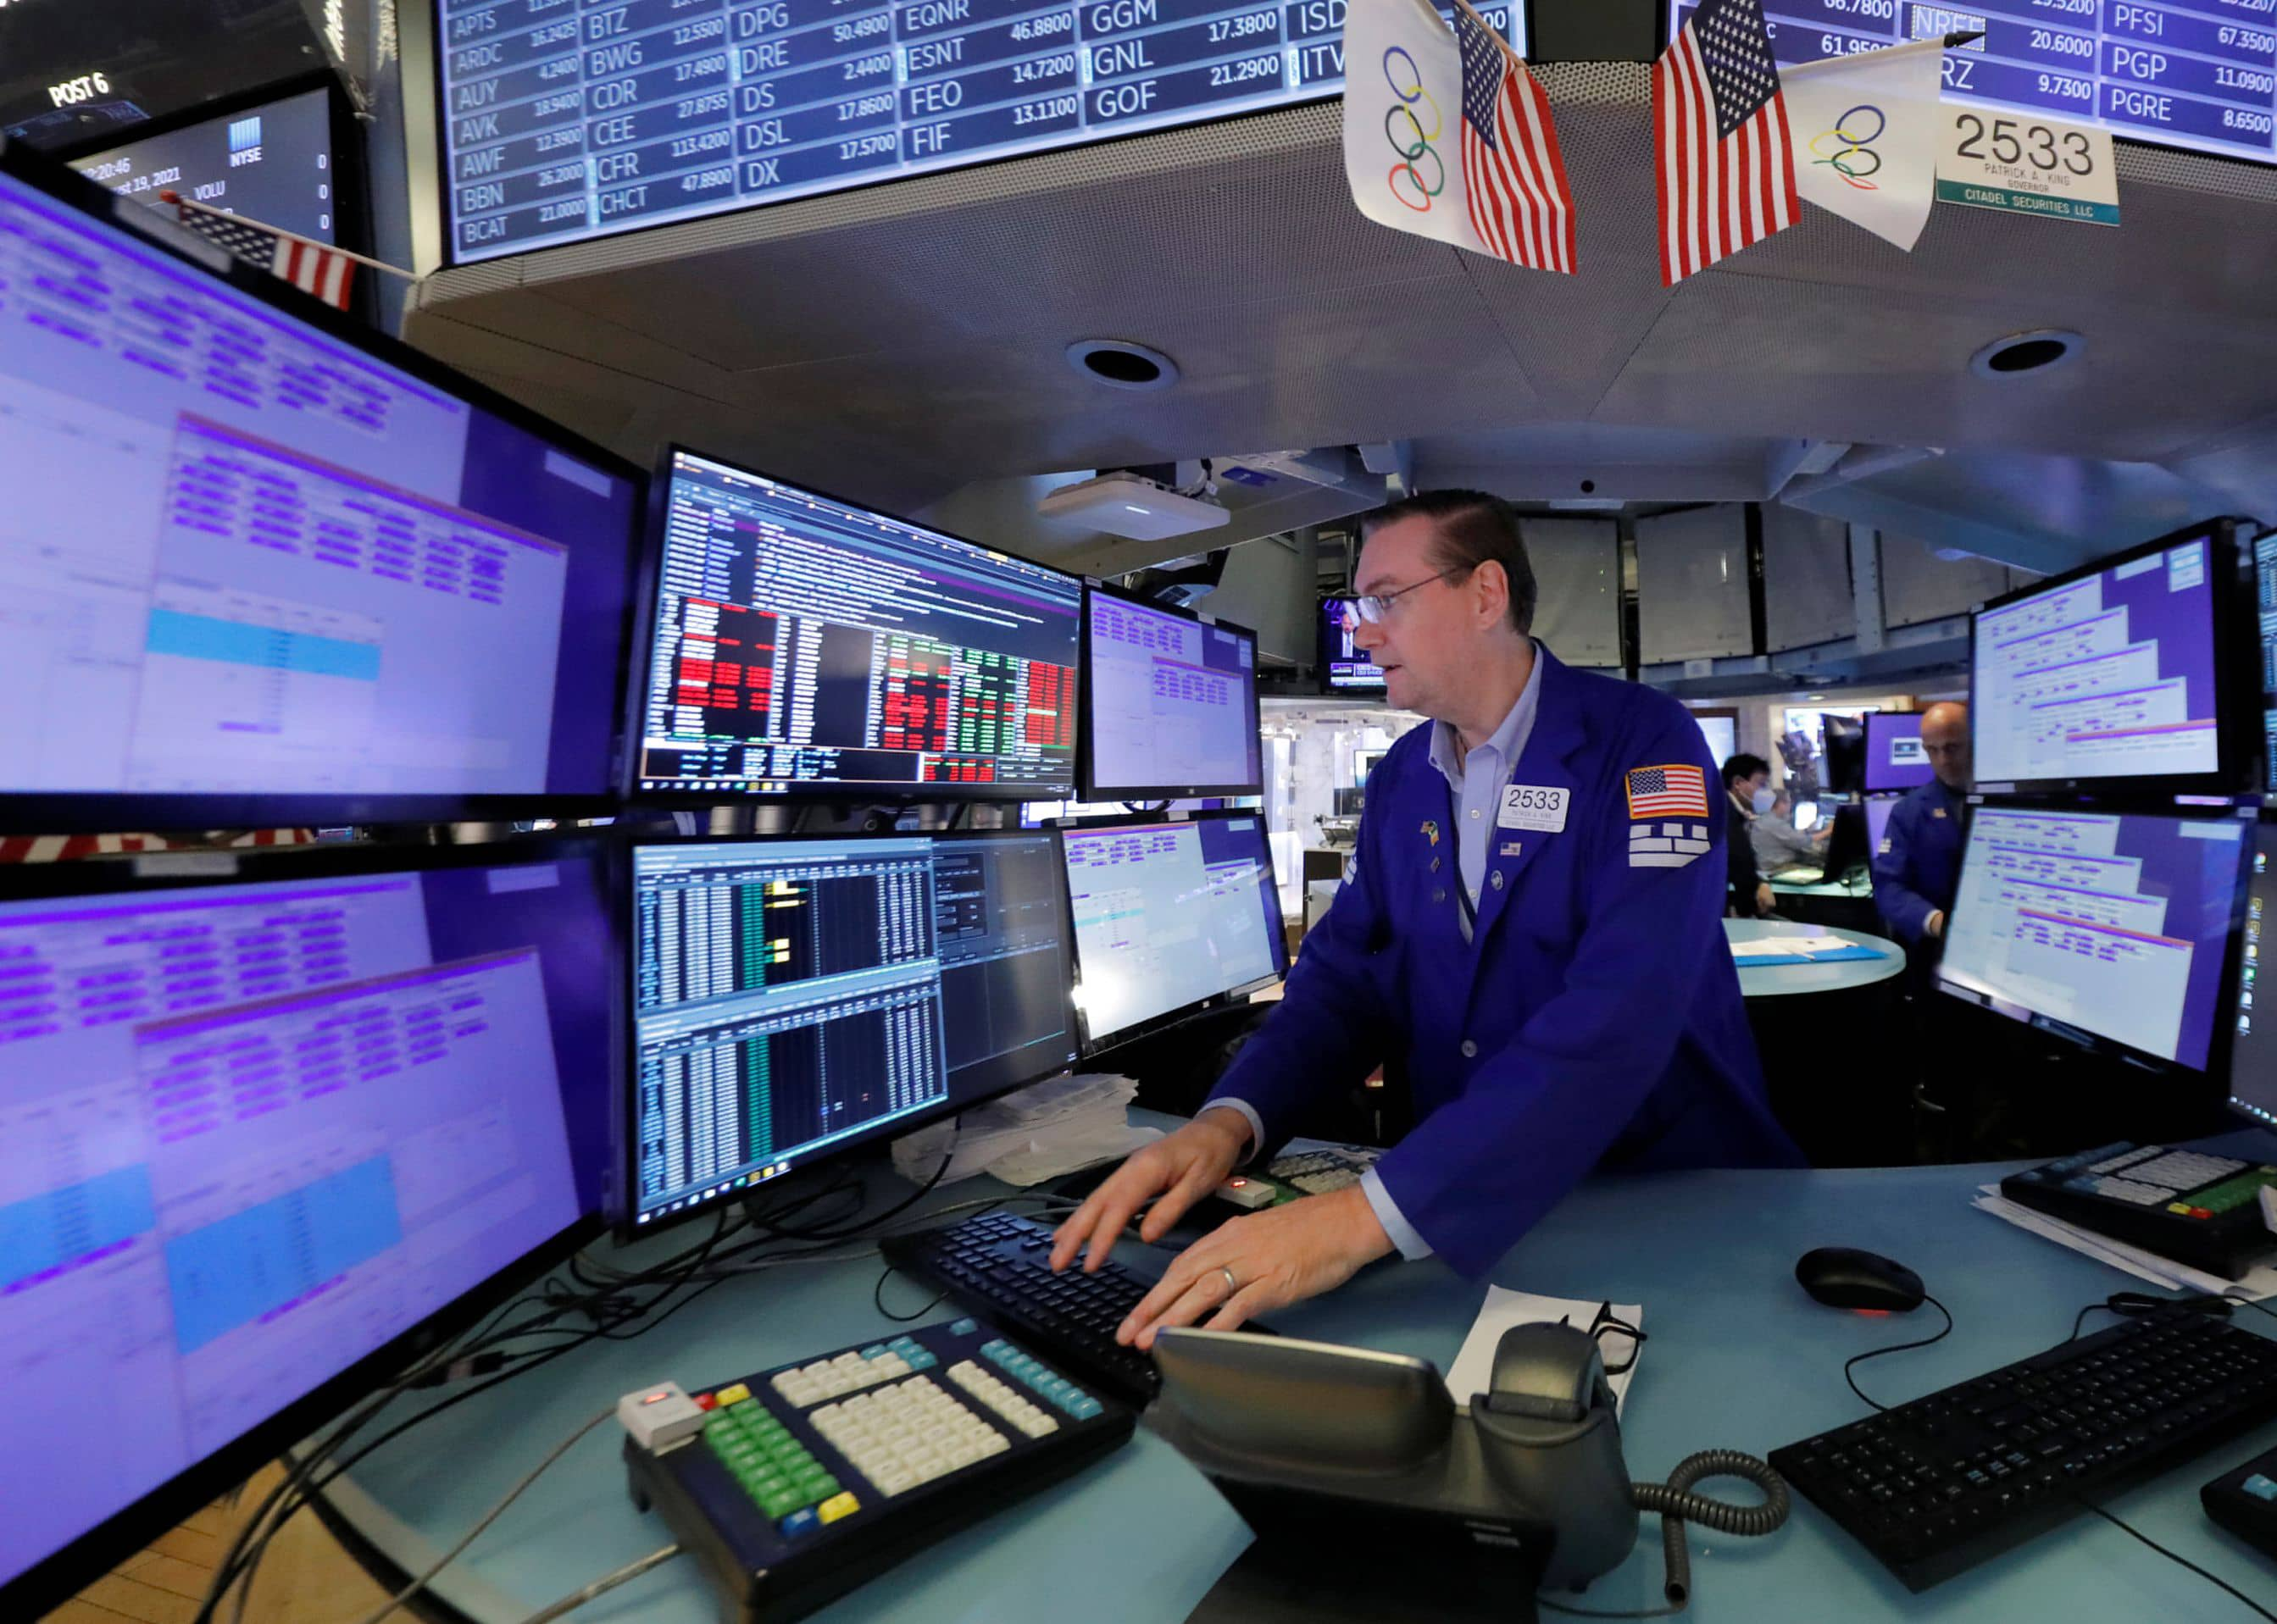 Saham berjangka lebih besar setelah Dow, S&P menghentikan jeda penurunan 4 hari menyusul tekad Fed thumbnail